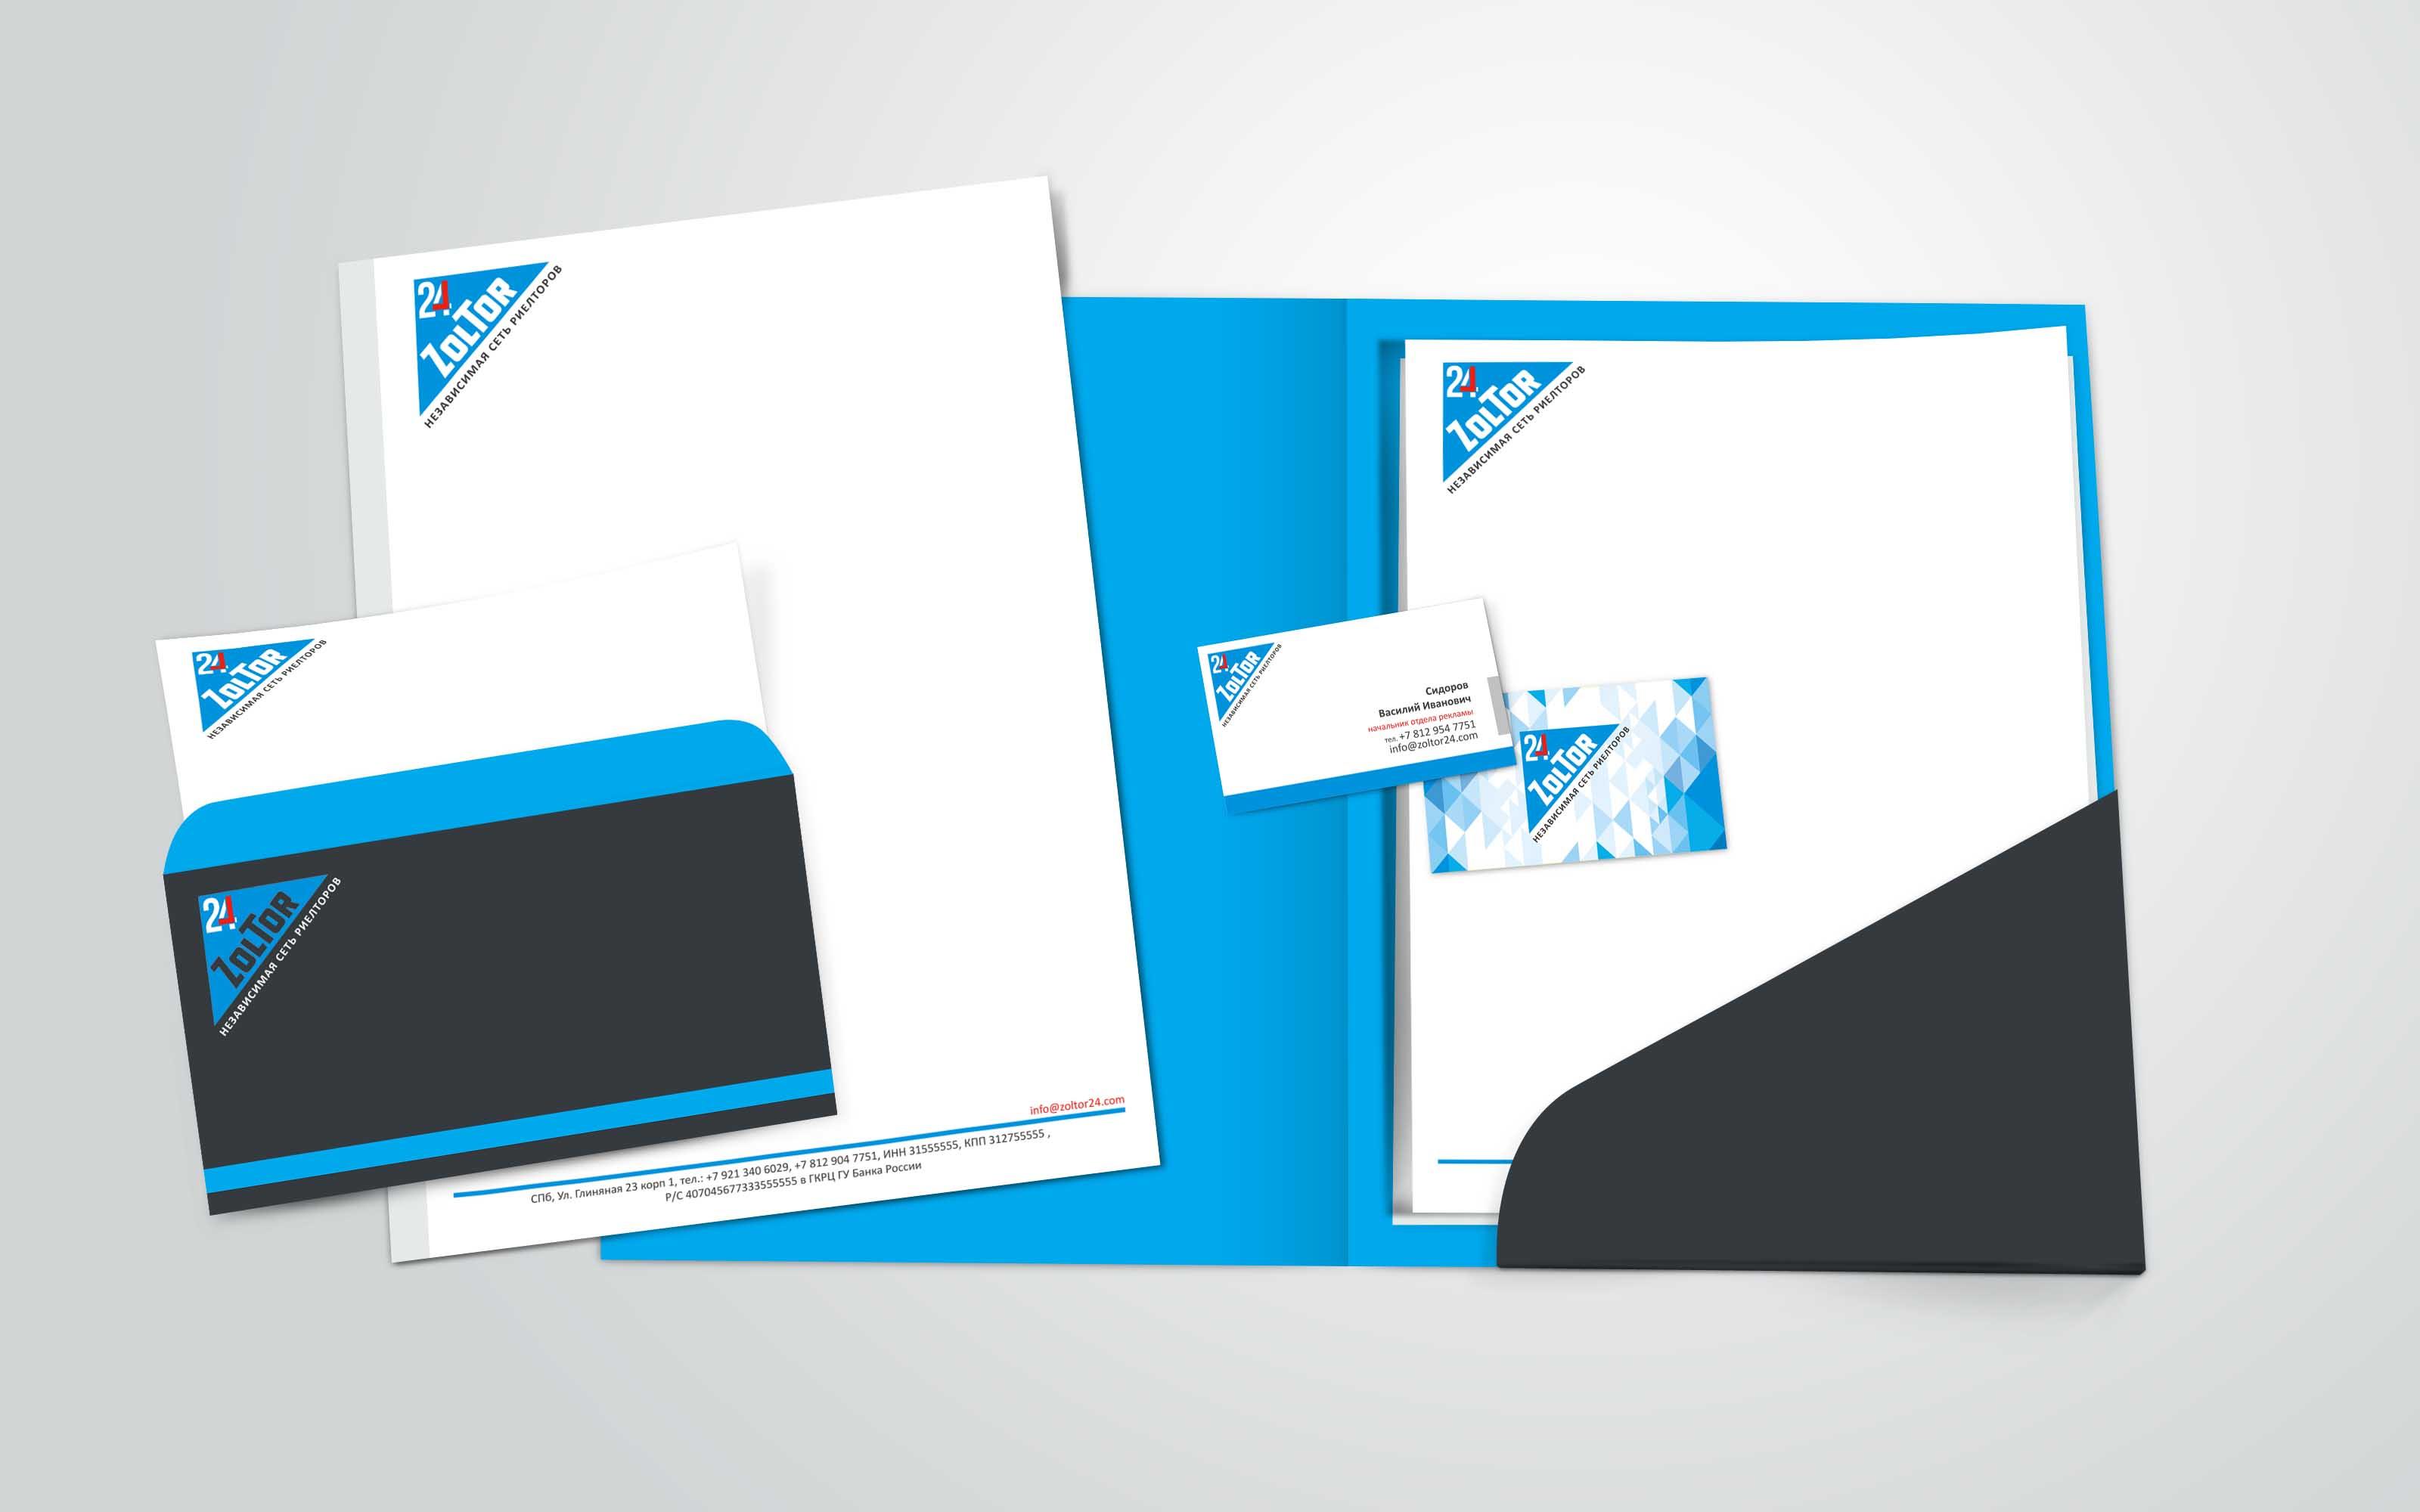 Логотип и фирменный стиль ZolTor24 фото f_0985c96592f7df64.jpg